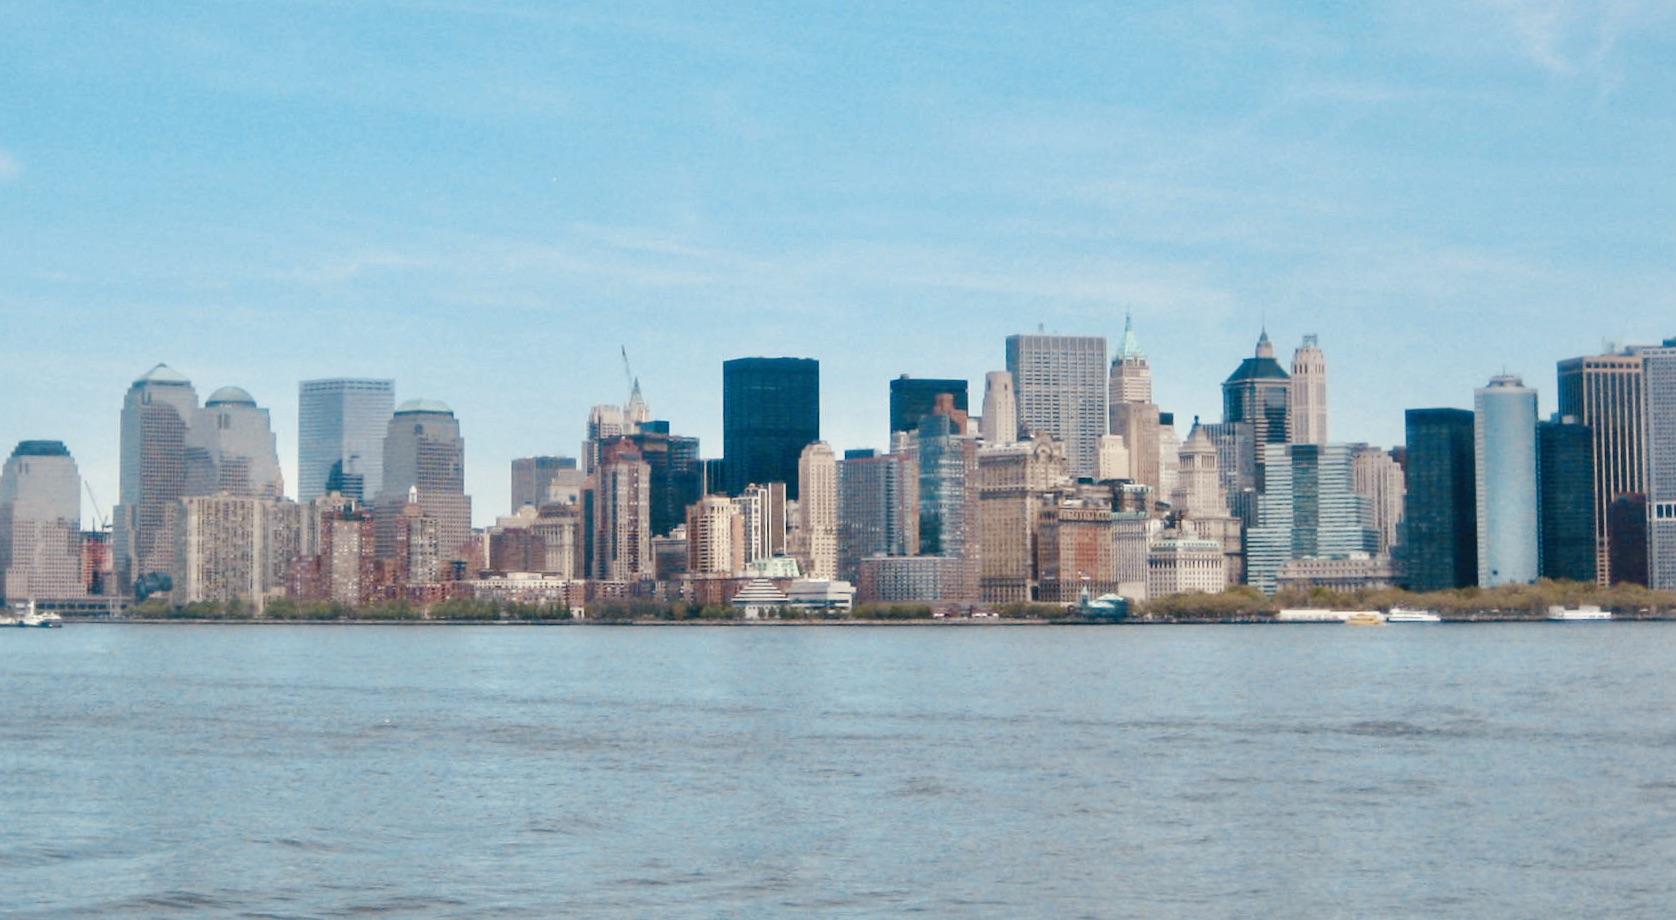 Boat cruise to Liberty Island NYC.